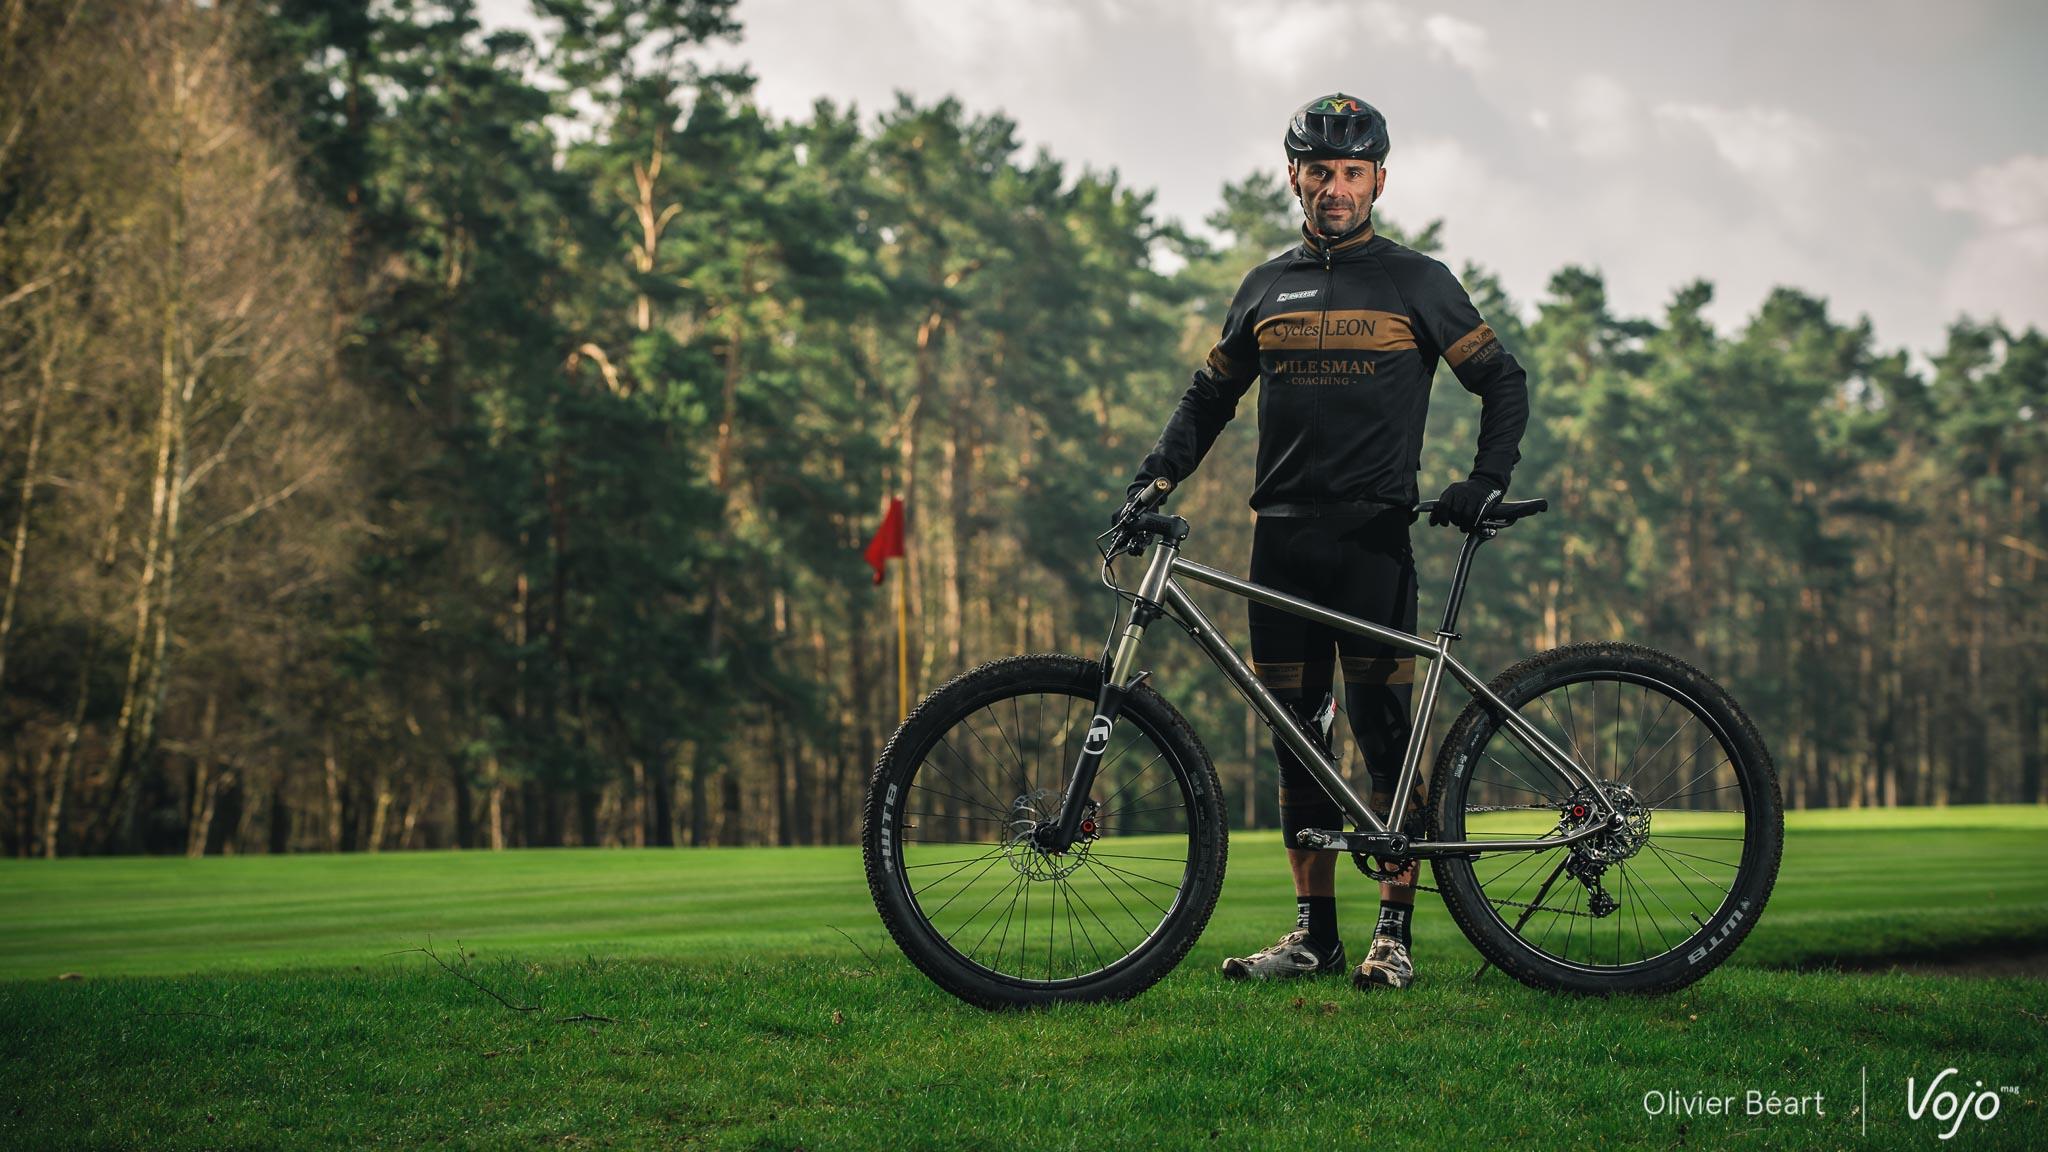 cycles_leon_decouverte_copyright_obeart_vojomag-31